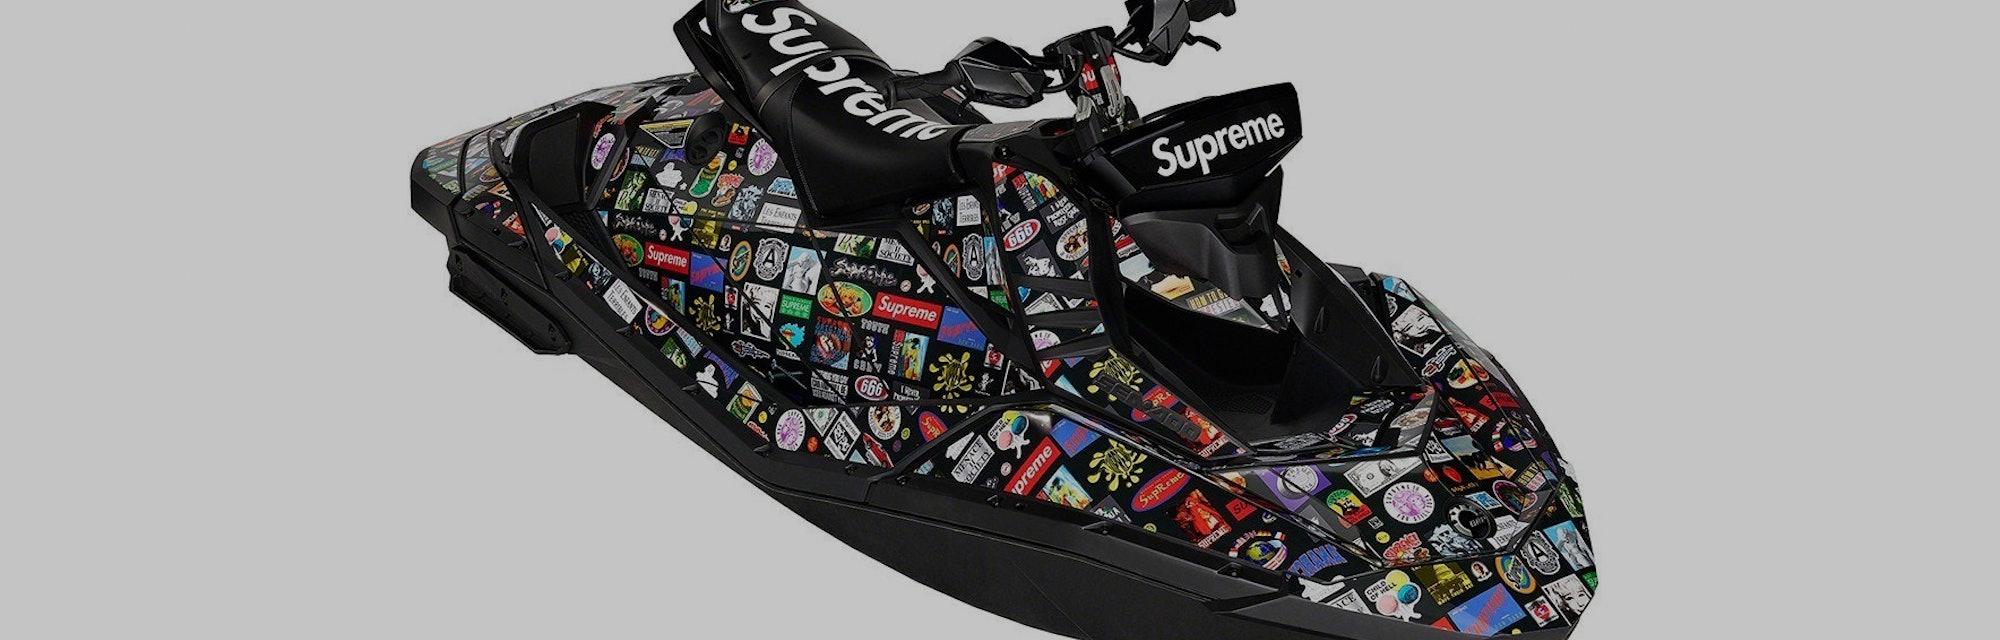 Supreme Sea-Doo Spark Trixx